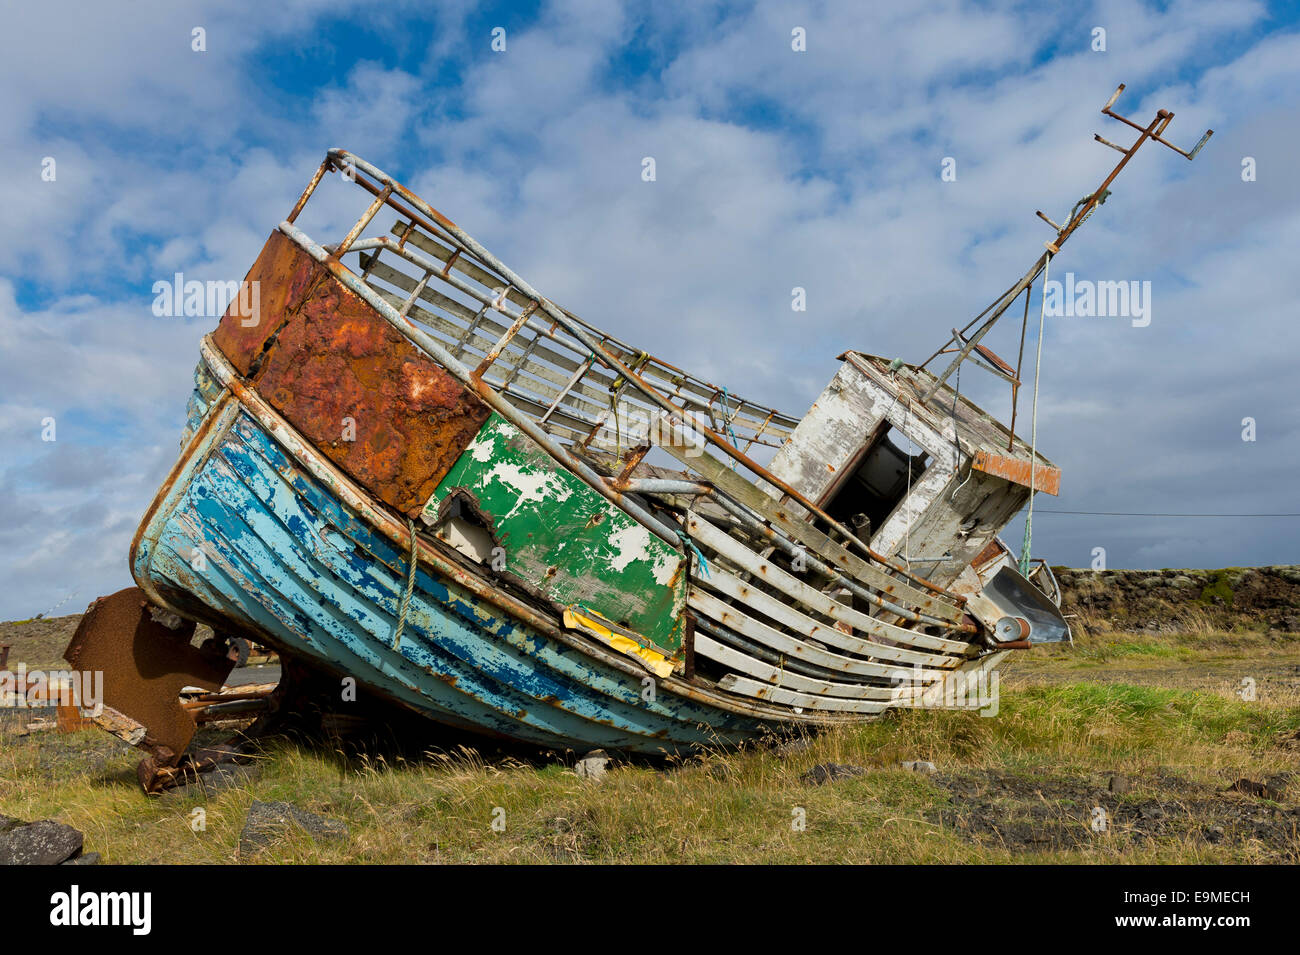 Rusting, decaying old fishing boat, Reykjanesskagi, Southern Peninsula or Reykjanes, Iceland - Stock Image